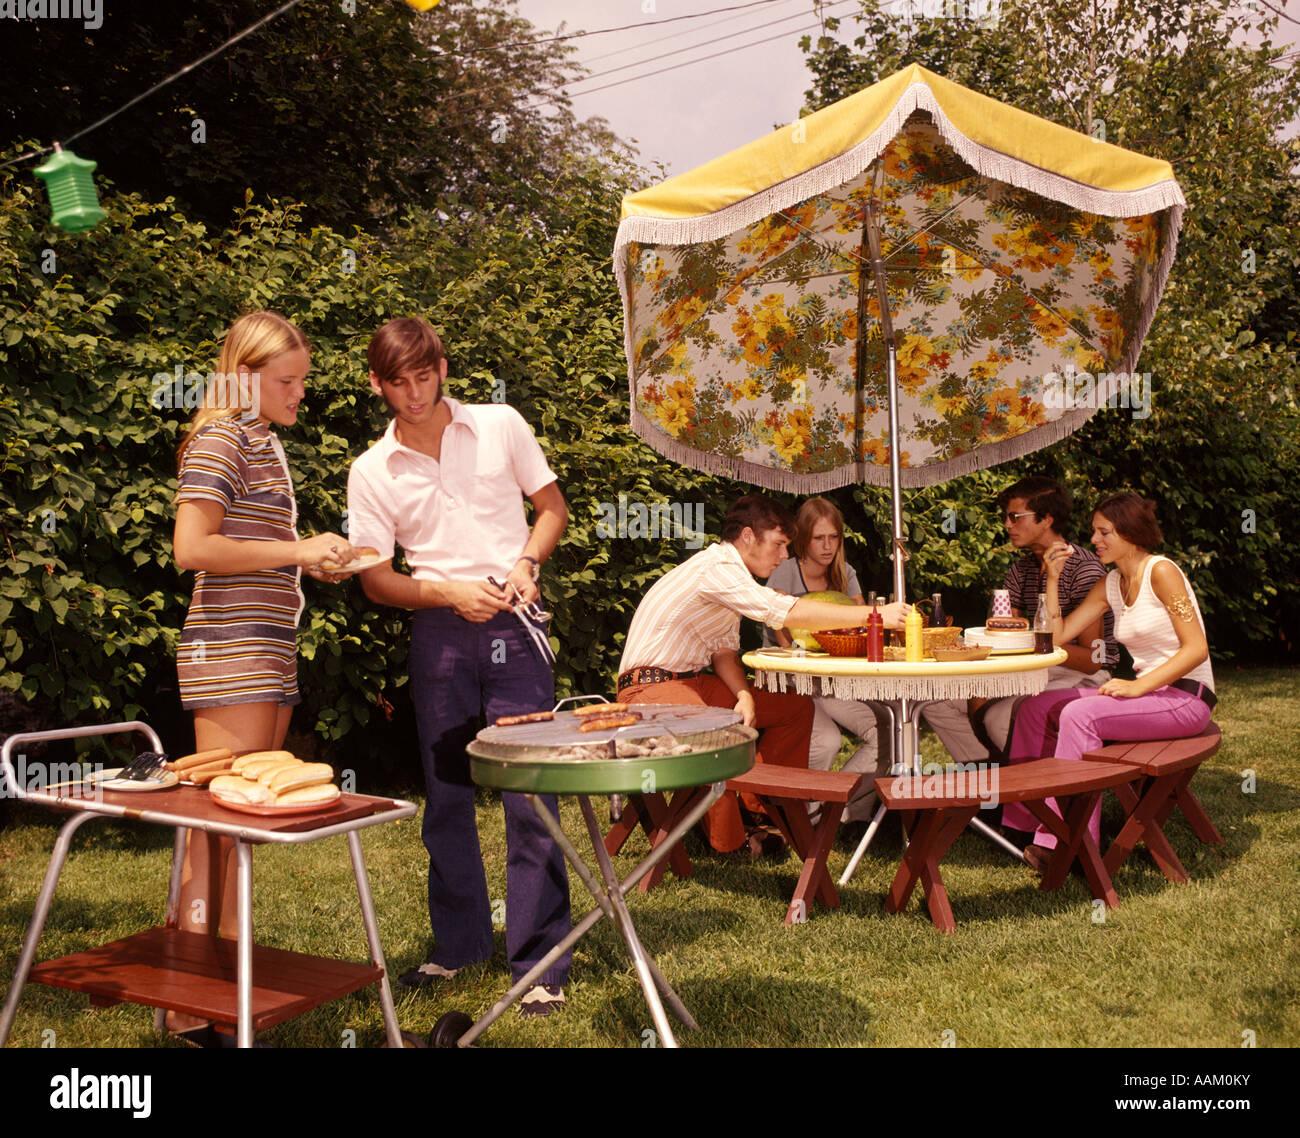 1970s GROUP TEENAGERS BOYS GIRLS BACKYARD GRILLING TABLE UMBRELLA - Stock Image